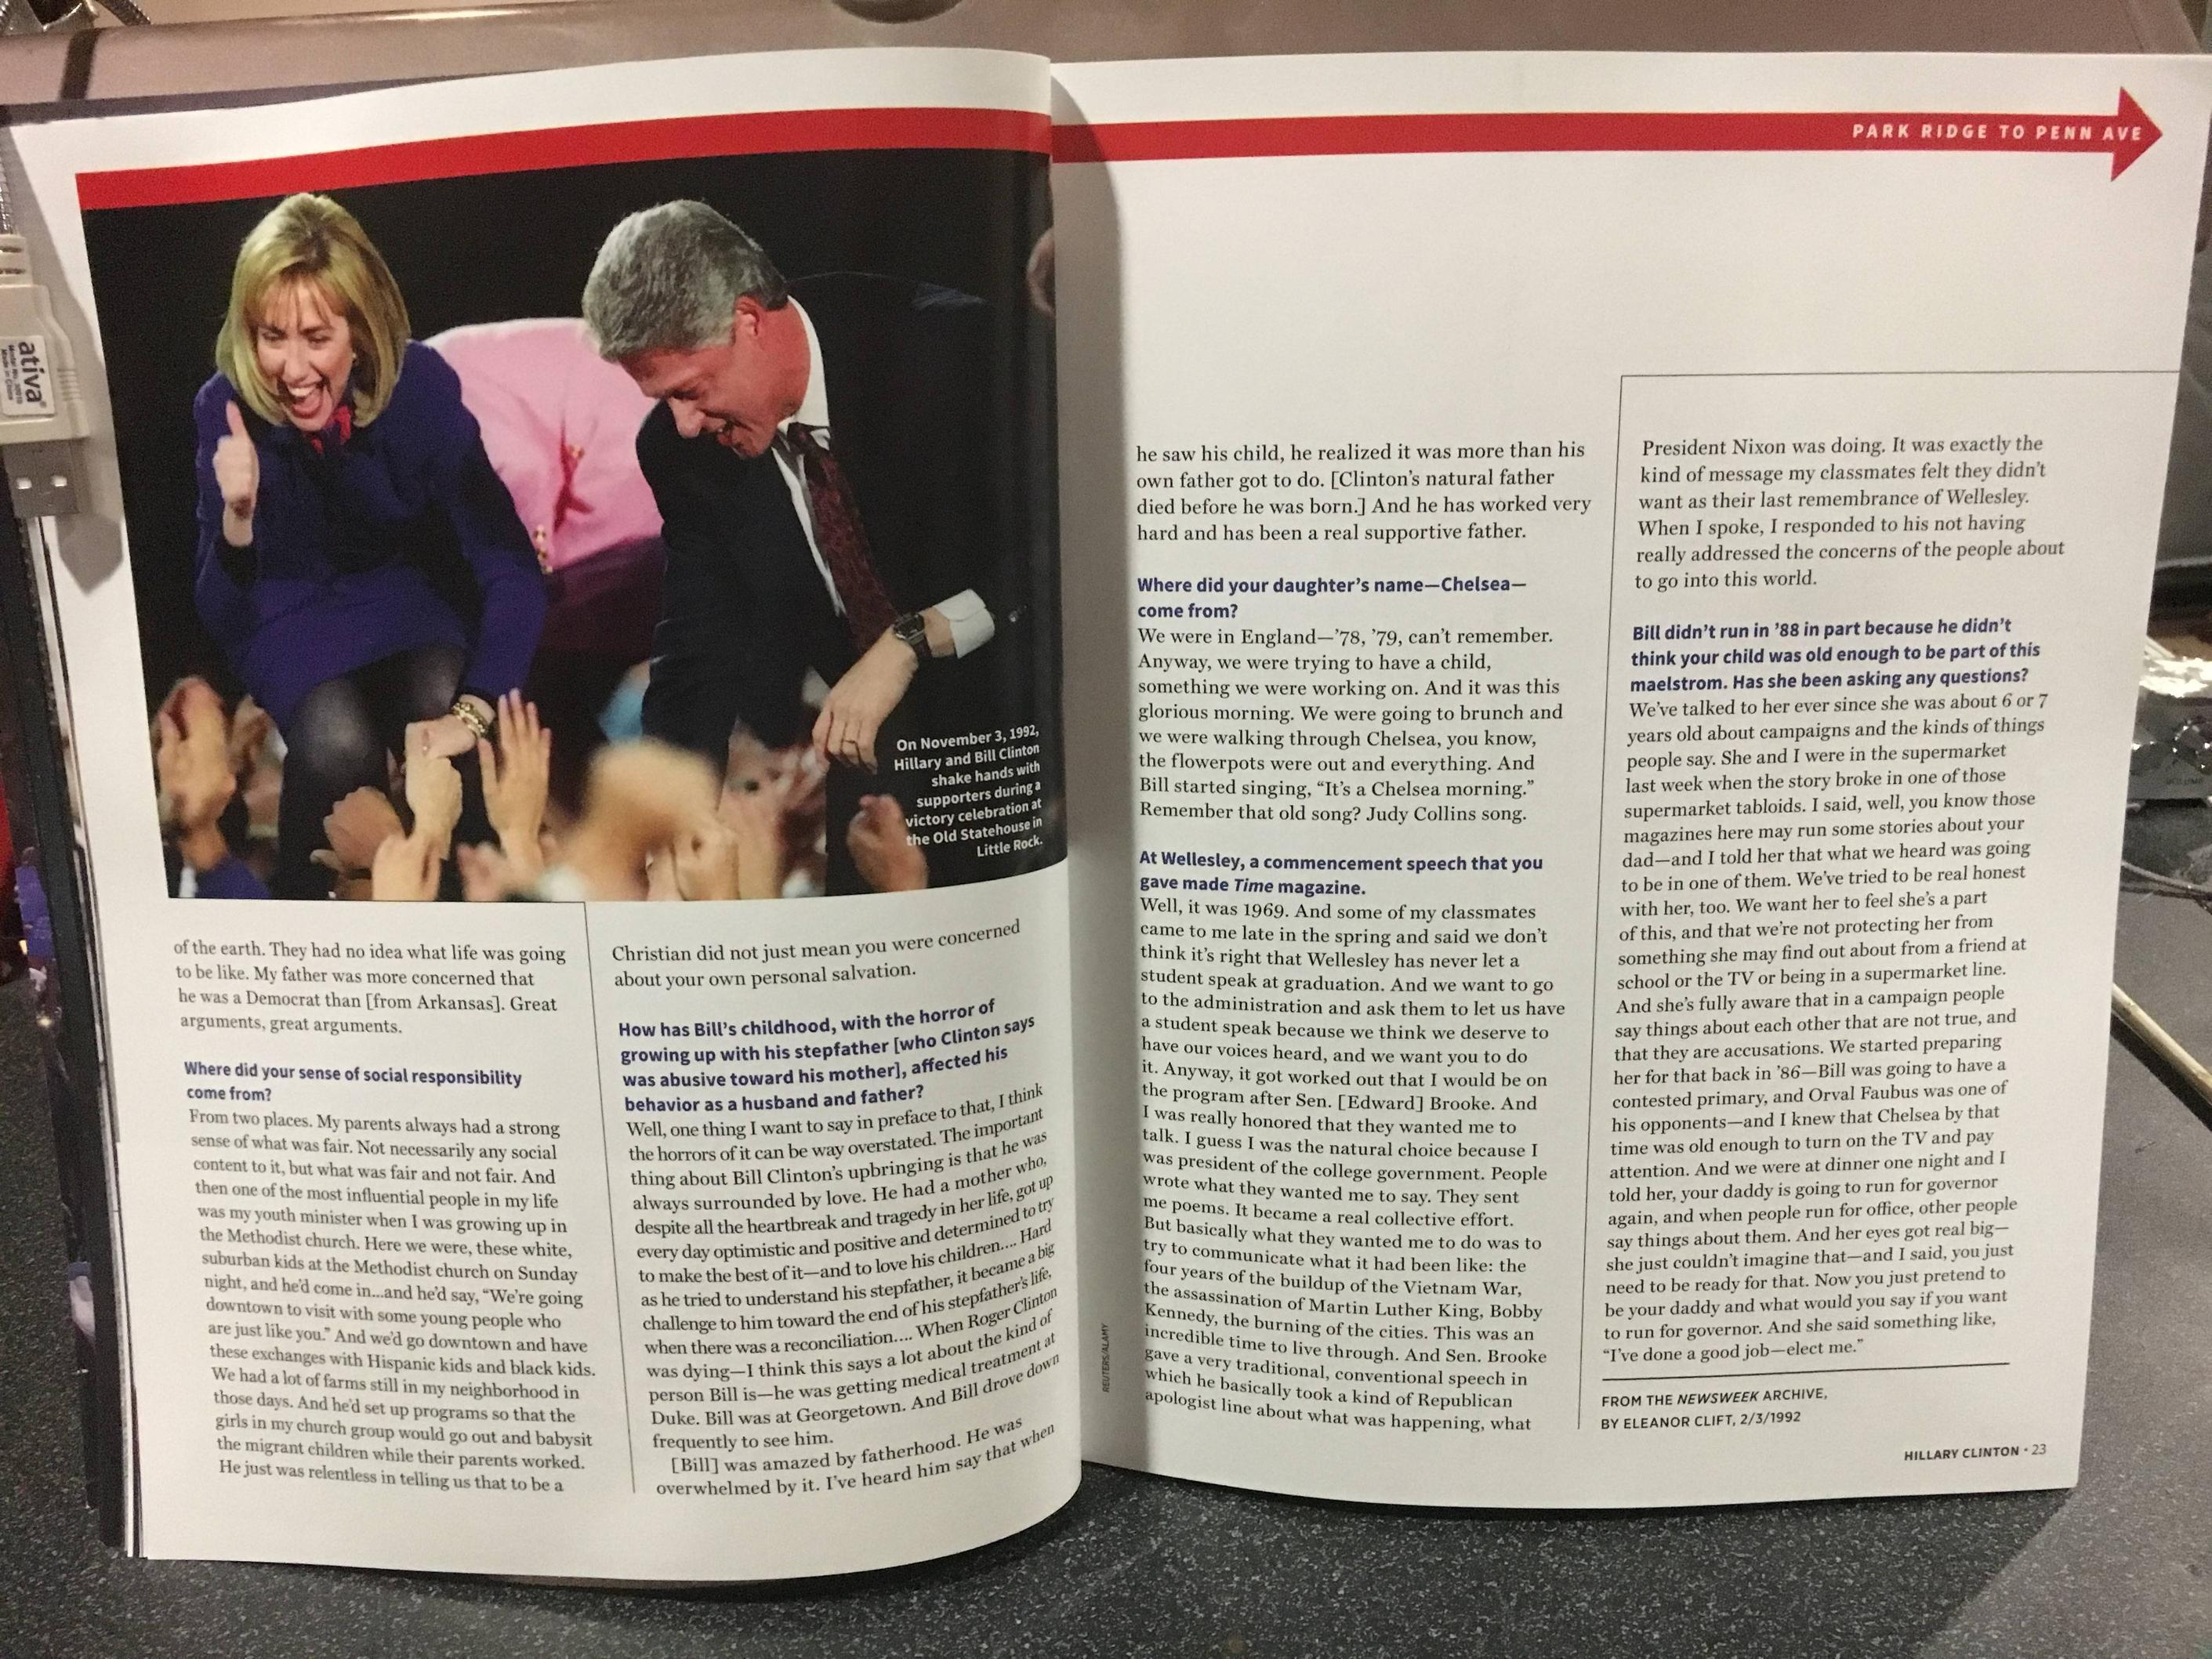 newsweek-madame-hillary-clinton-page-11